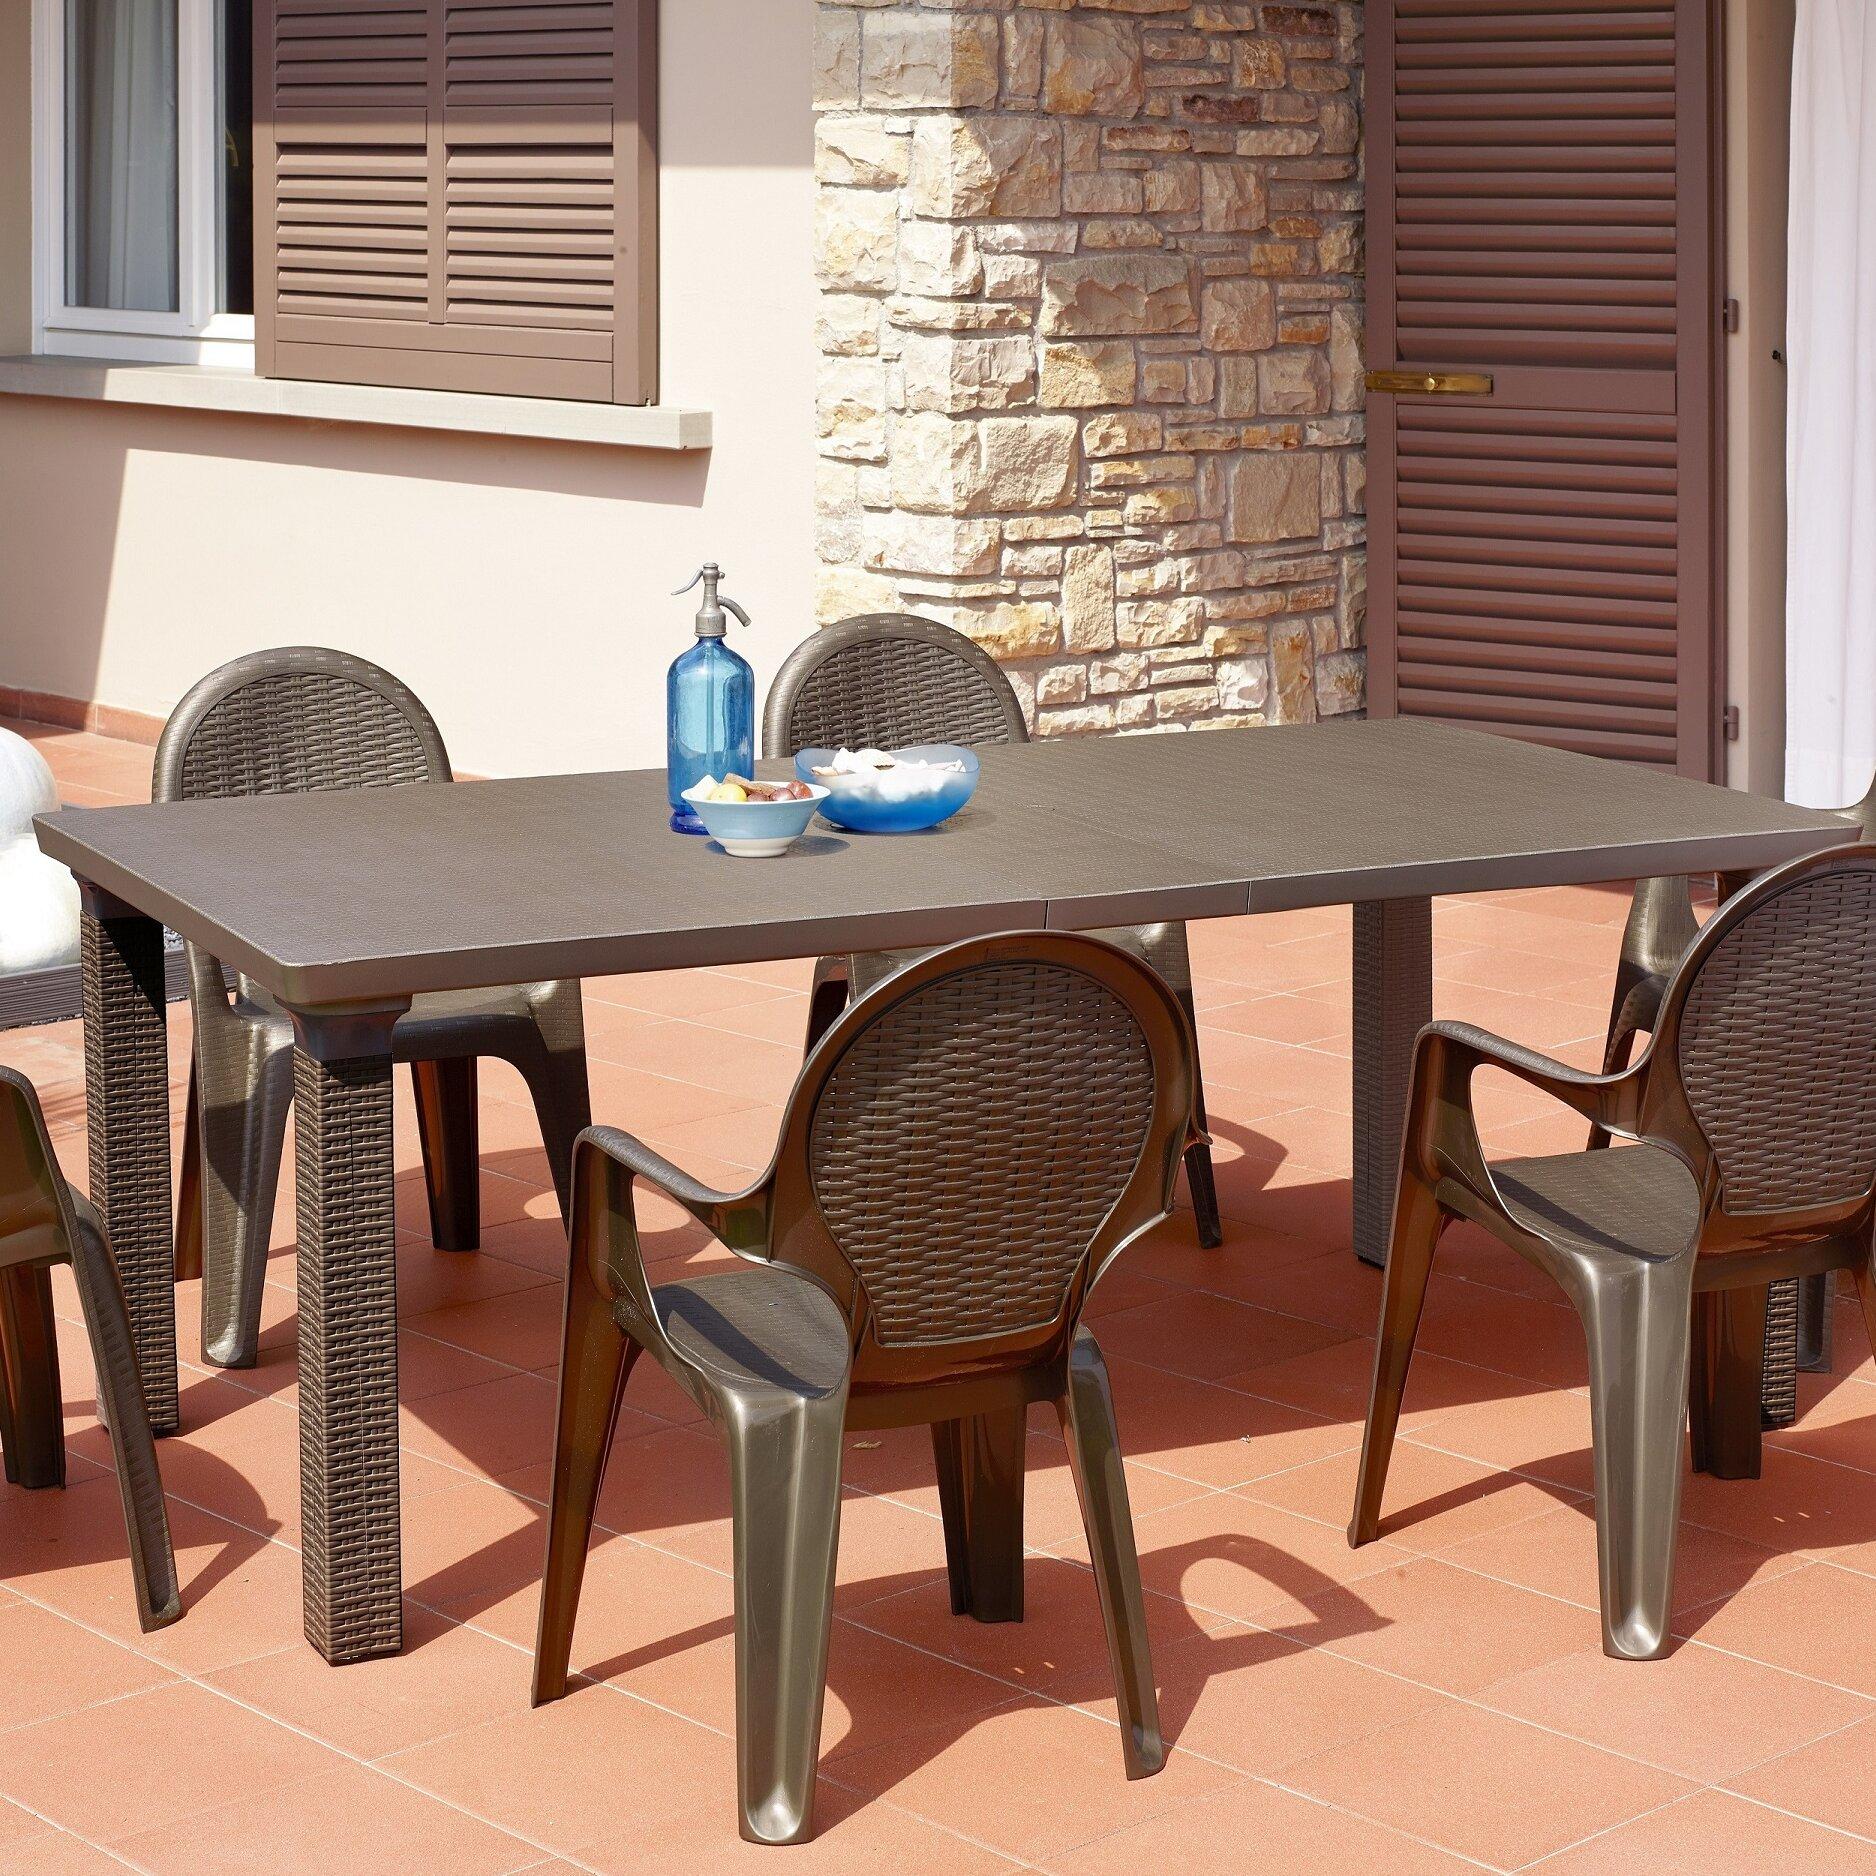 Extending Outdoor Dining Table Extending Outdoor Dining Table Dining Table Ideas